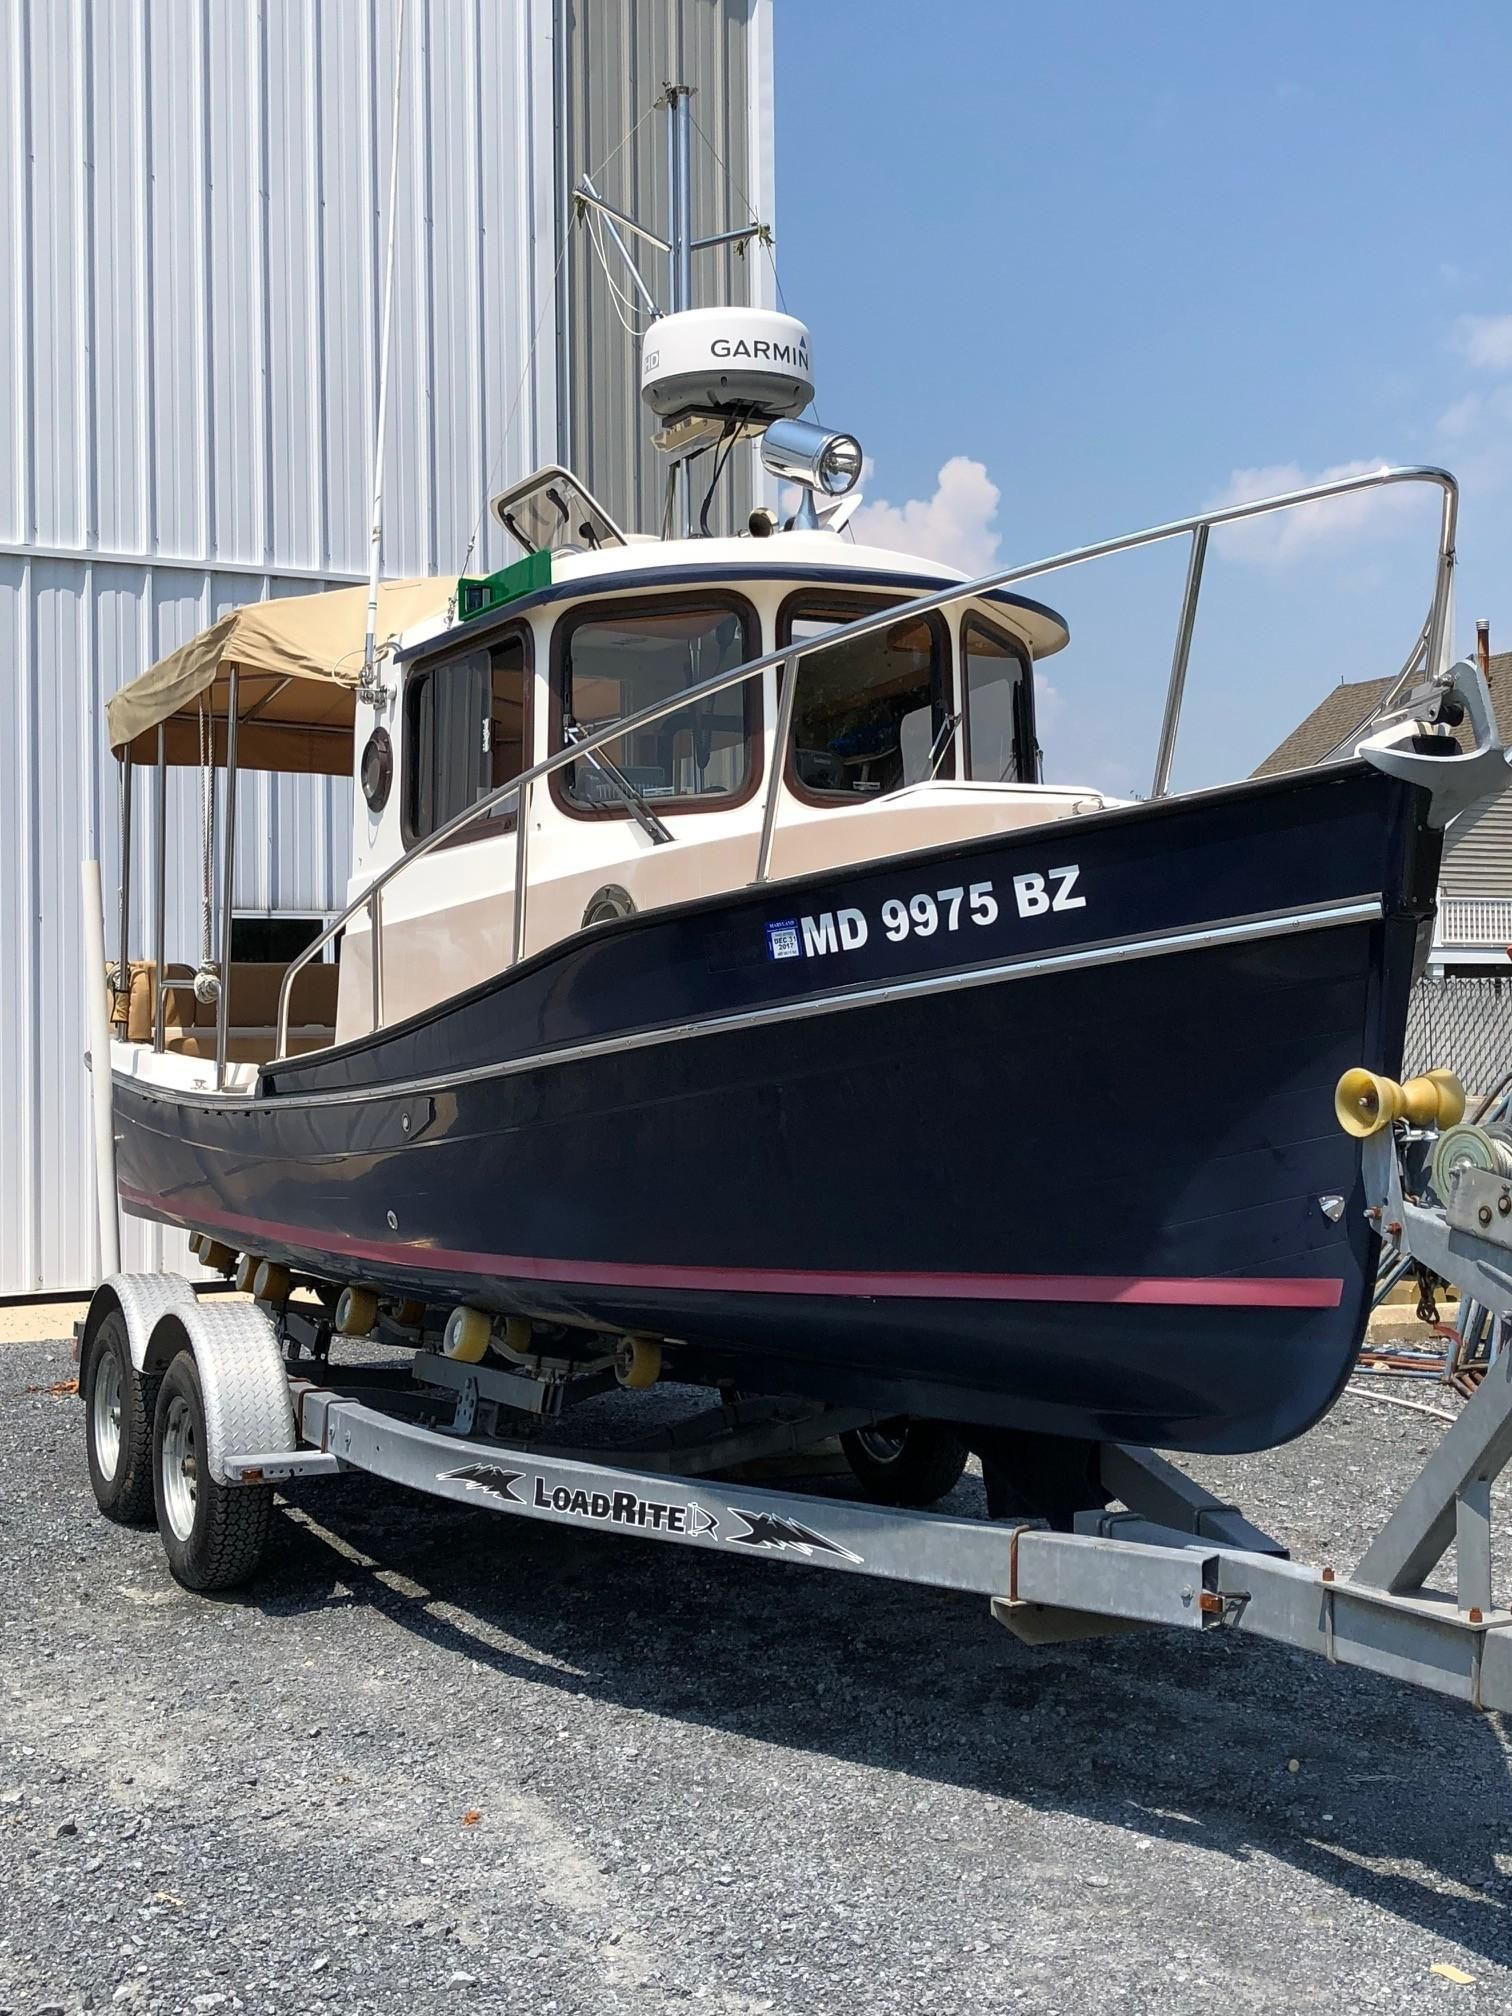 2008 Ranger Tugs 21 Ec Power Boat For Sale Wiring Diagram Bilge